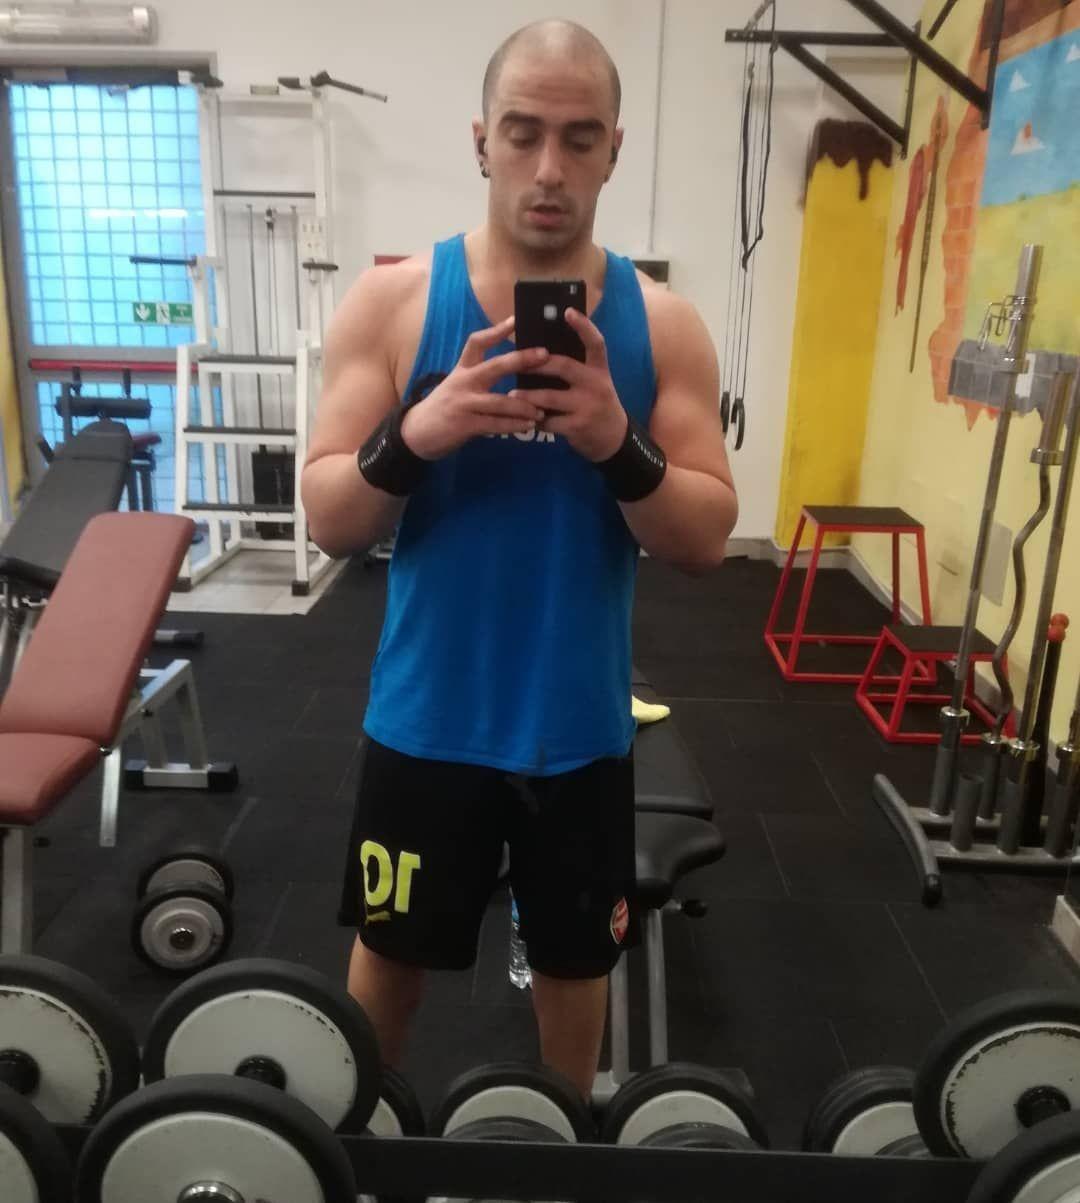 Ma I Pelati Fin Dove Si Lavano La Testa Gym Gymlove Gymfamily Gymresults Gymmotivation Gymlife Gymanimal Gymp Workout Plan Workout Health Fitness